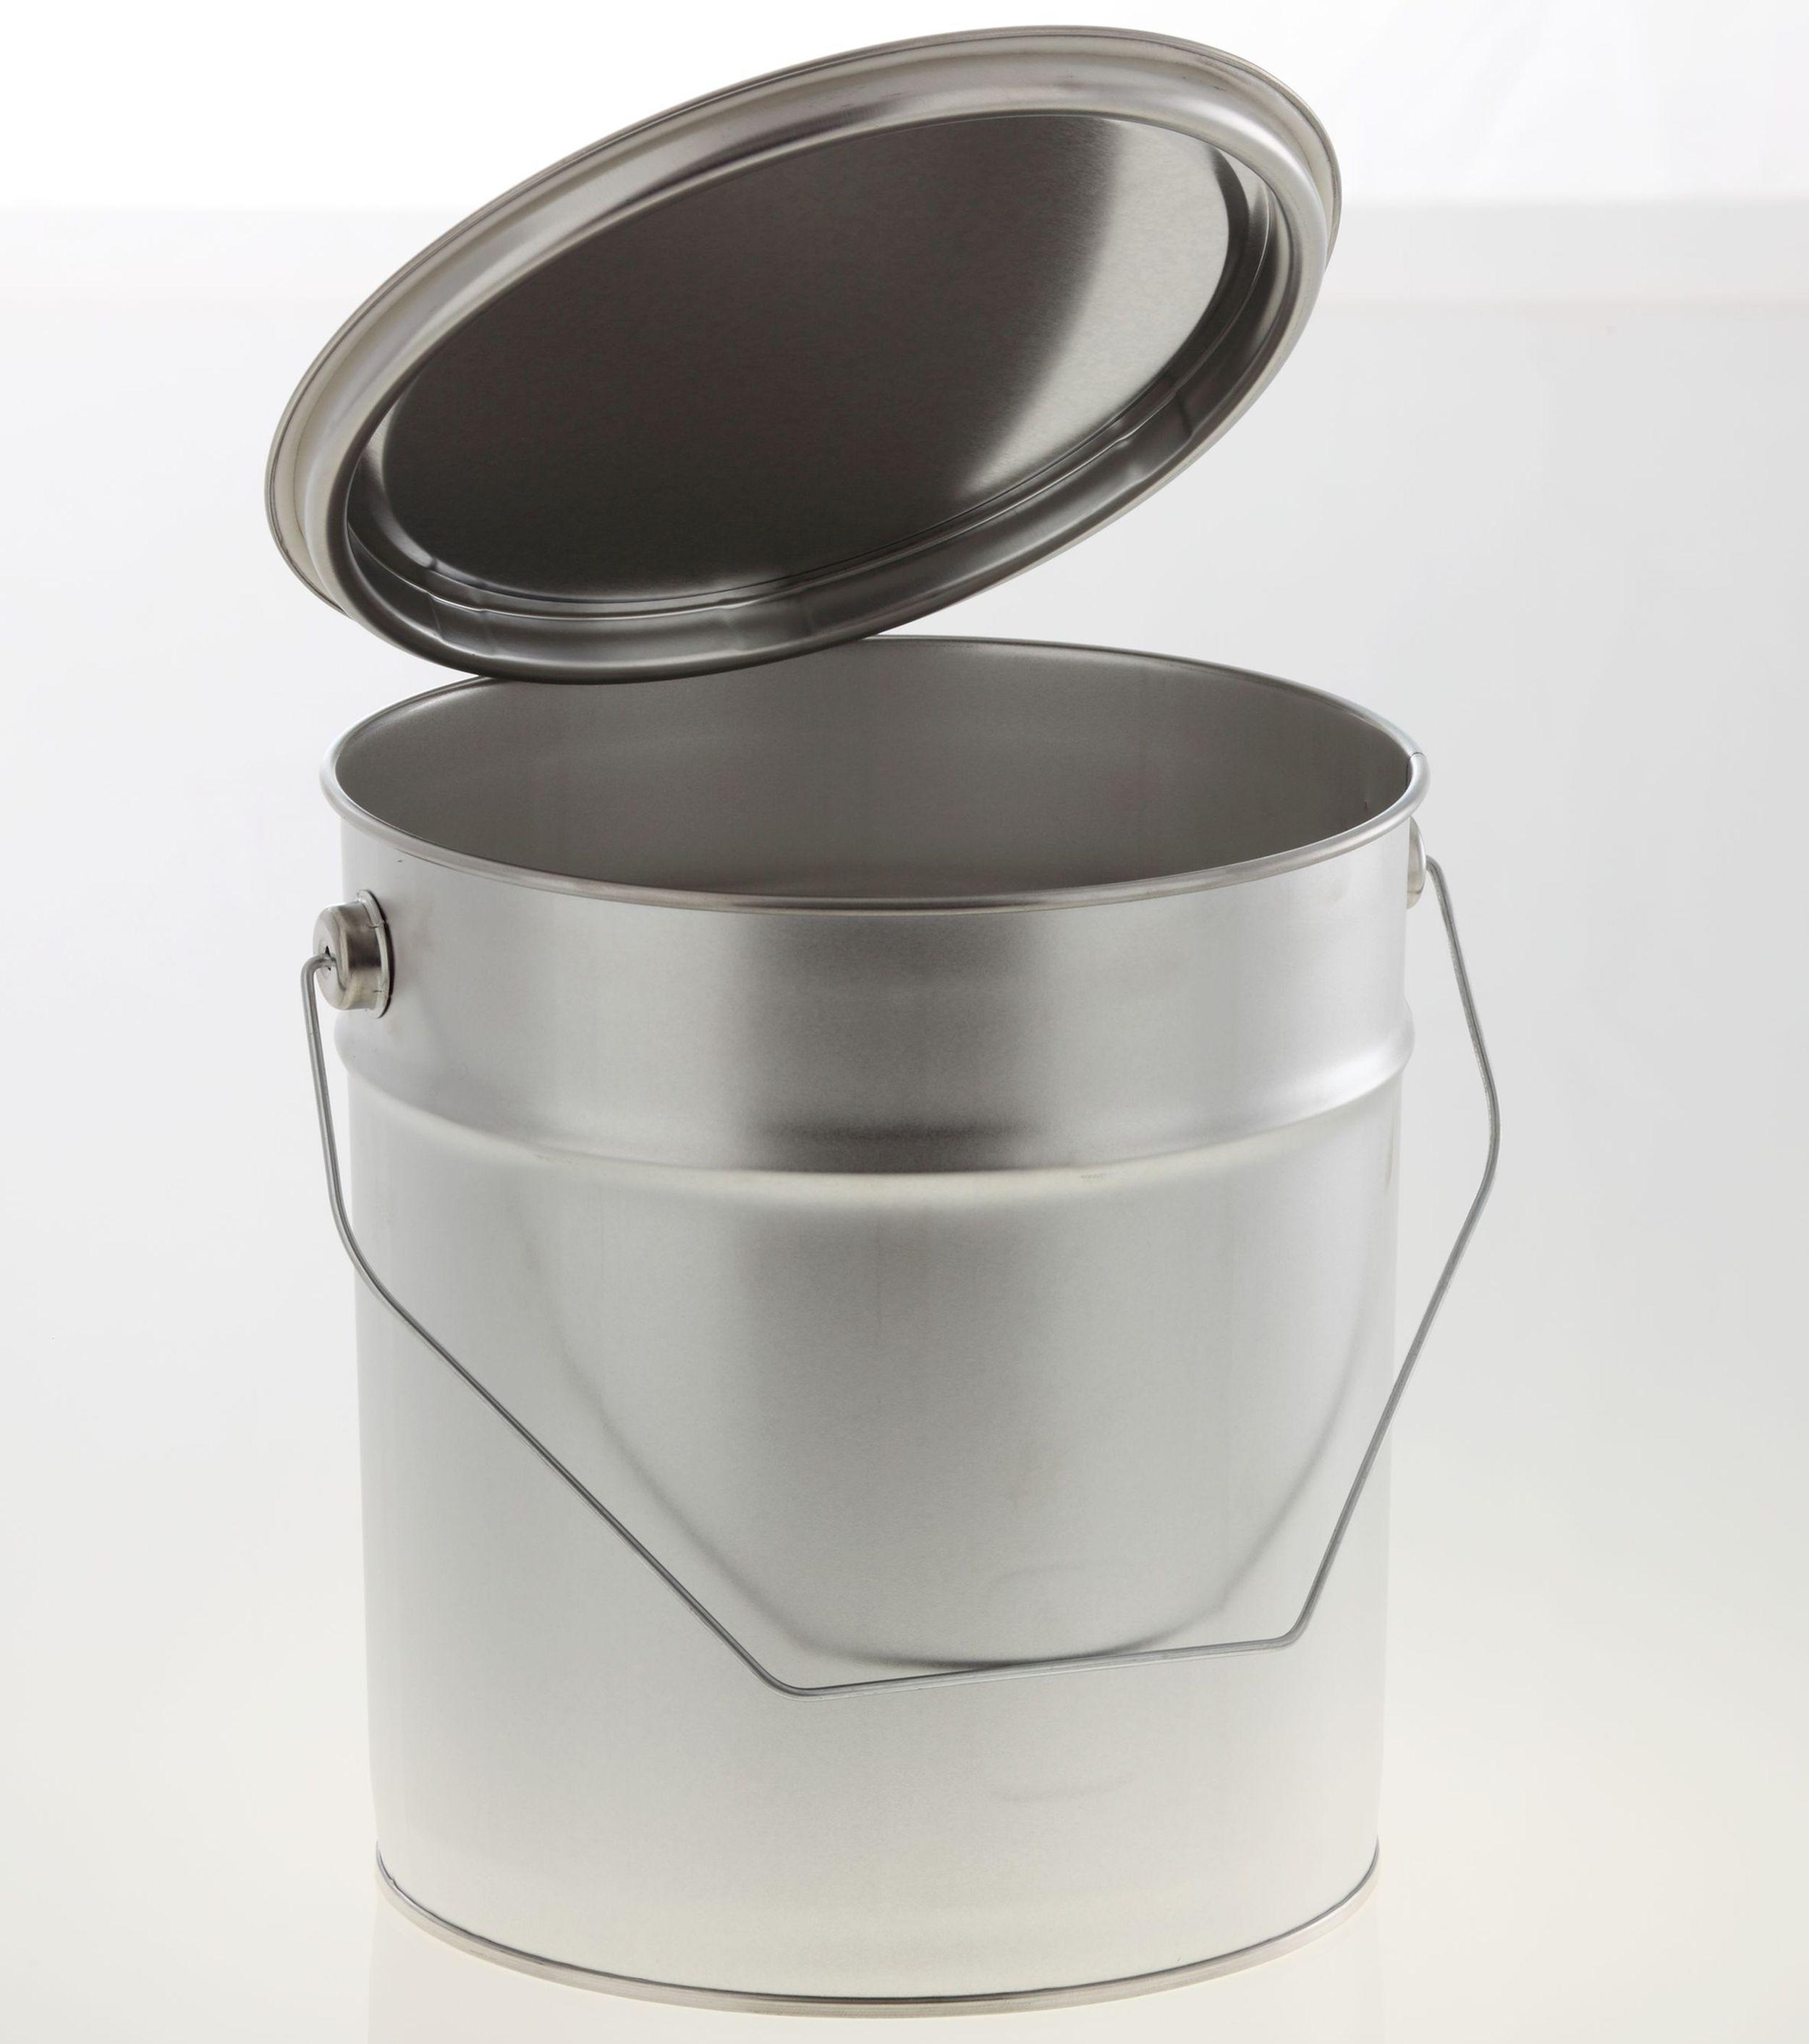 !NEU! Metalleimer 3 Liter lebensmittelecht OHNE Spannring